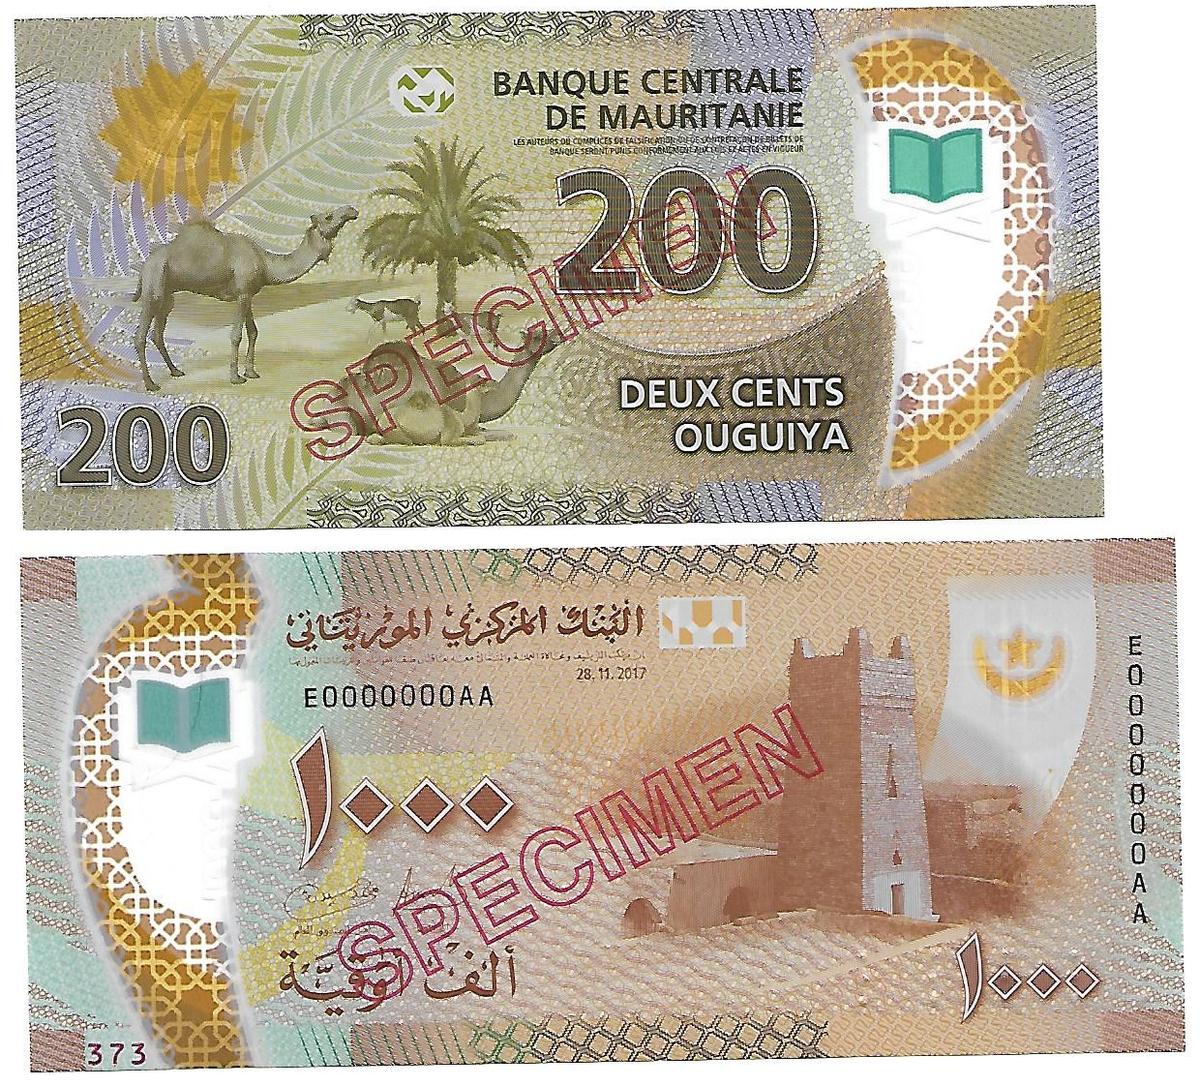 Economie De La Mauritanie Wikipedia